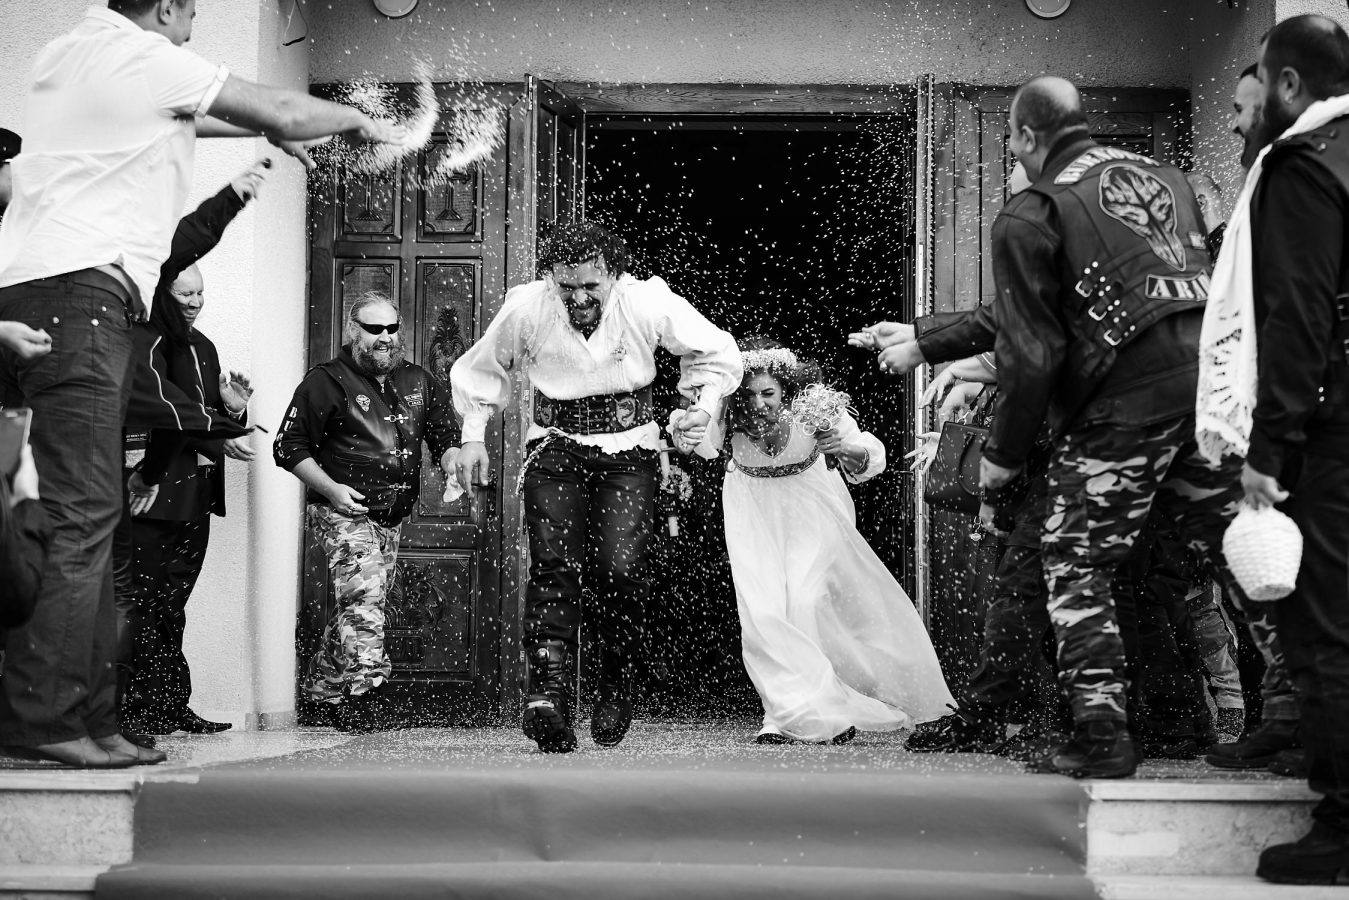 Jönköping Photography by Alin Popescu - Jönköping wedding photographer